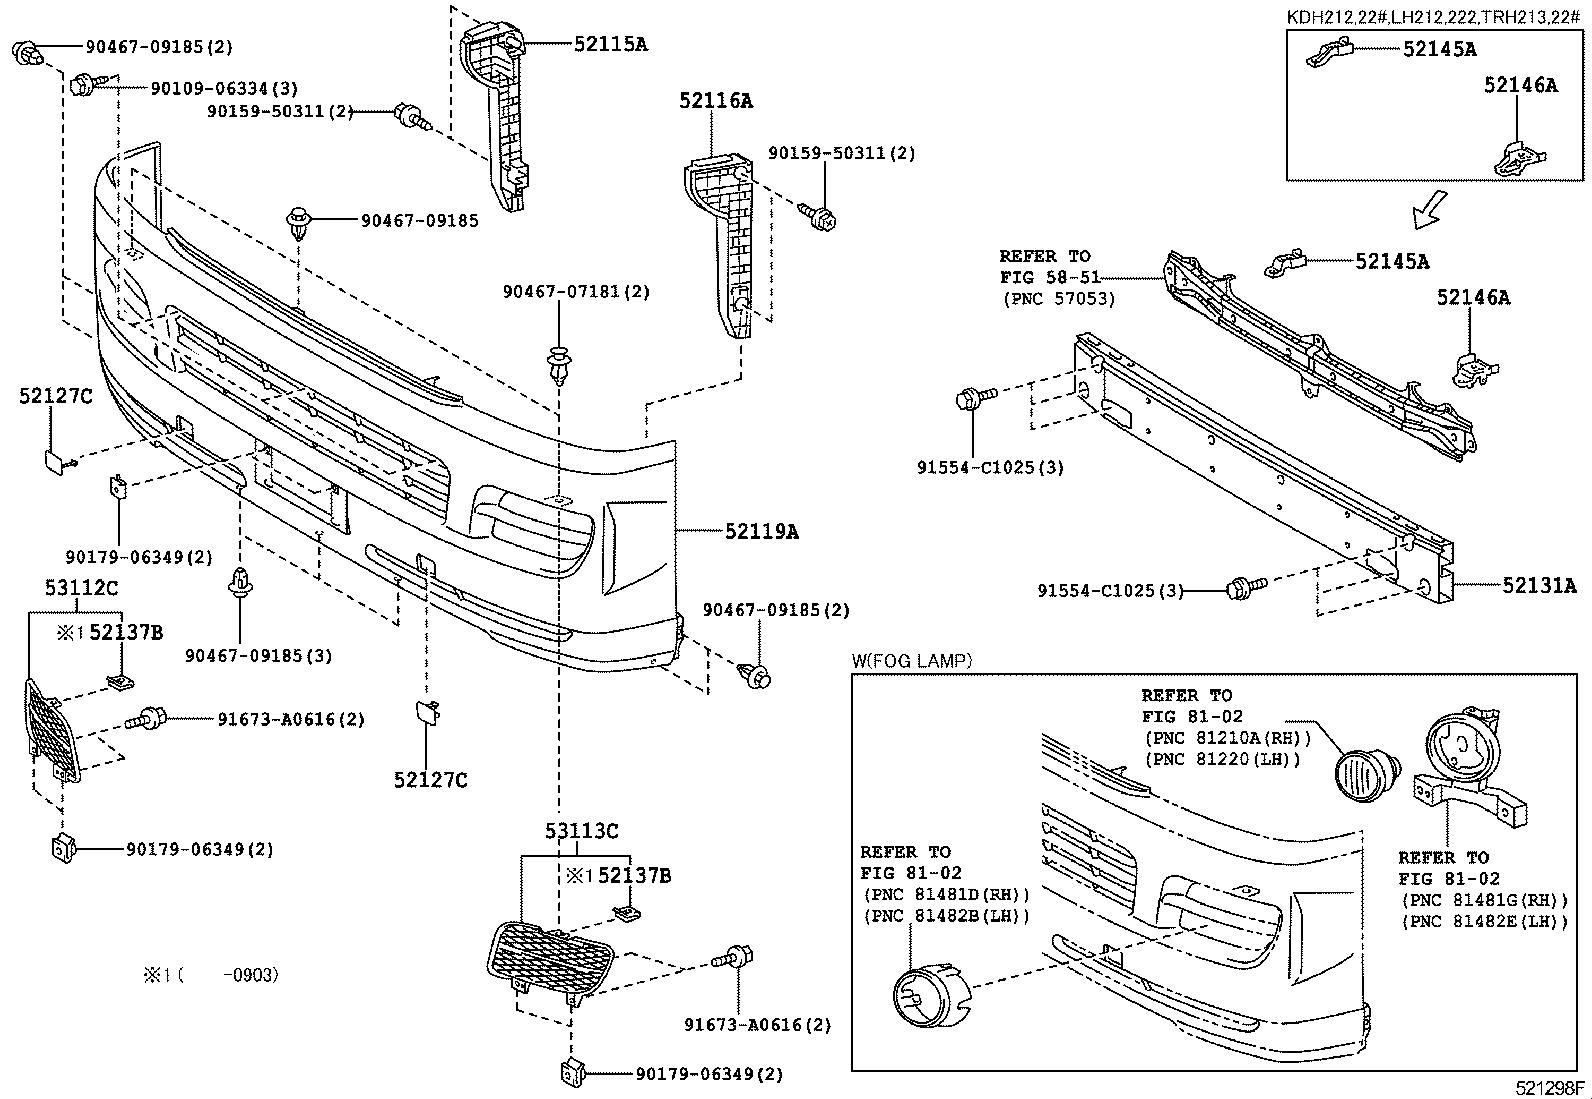 Car Body Parts Car Body Part Names Diagram And Car Body Parts Diagram